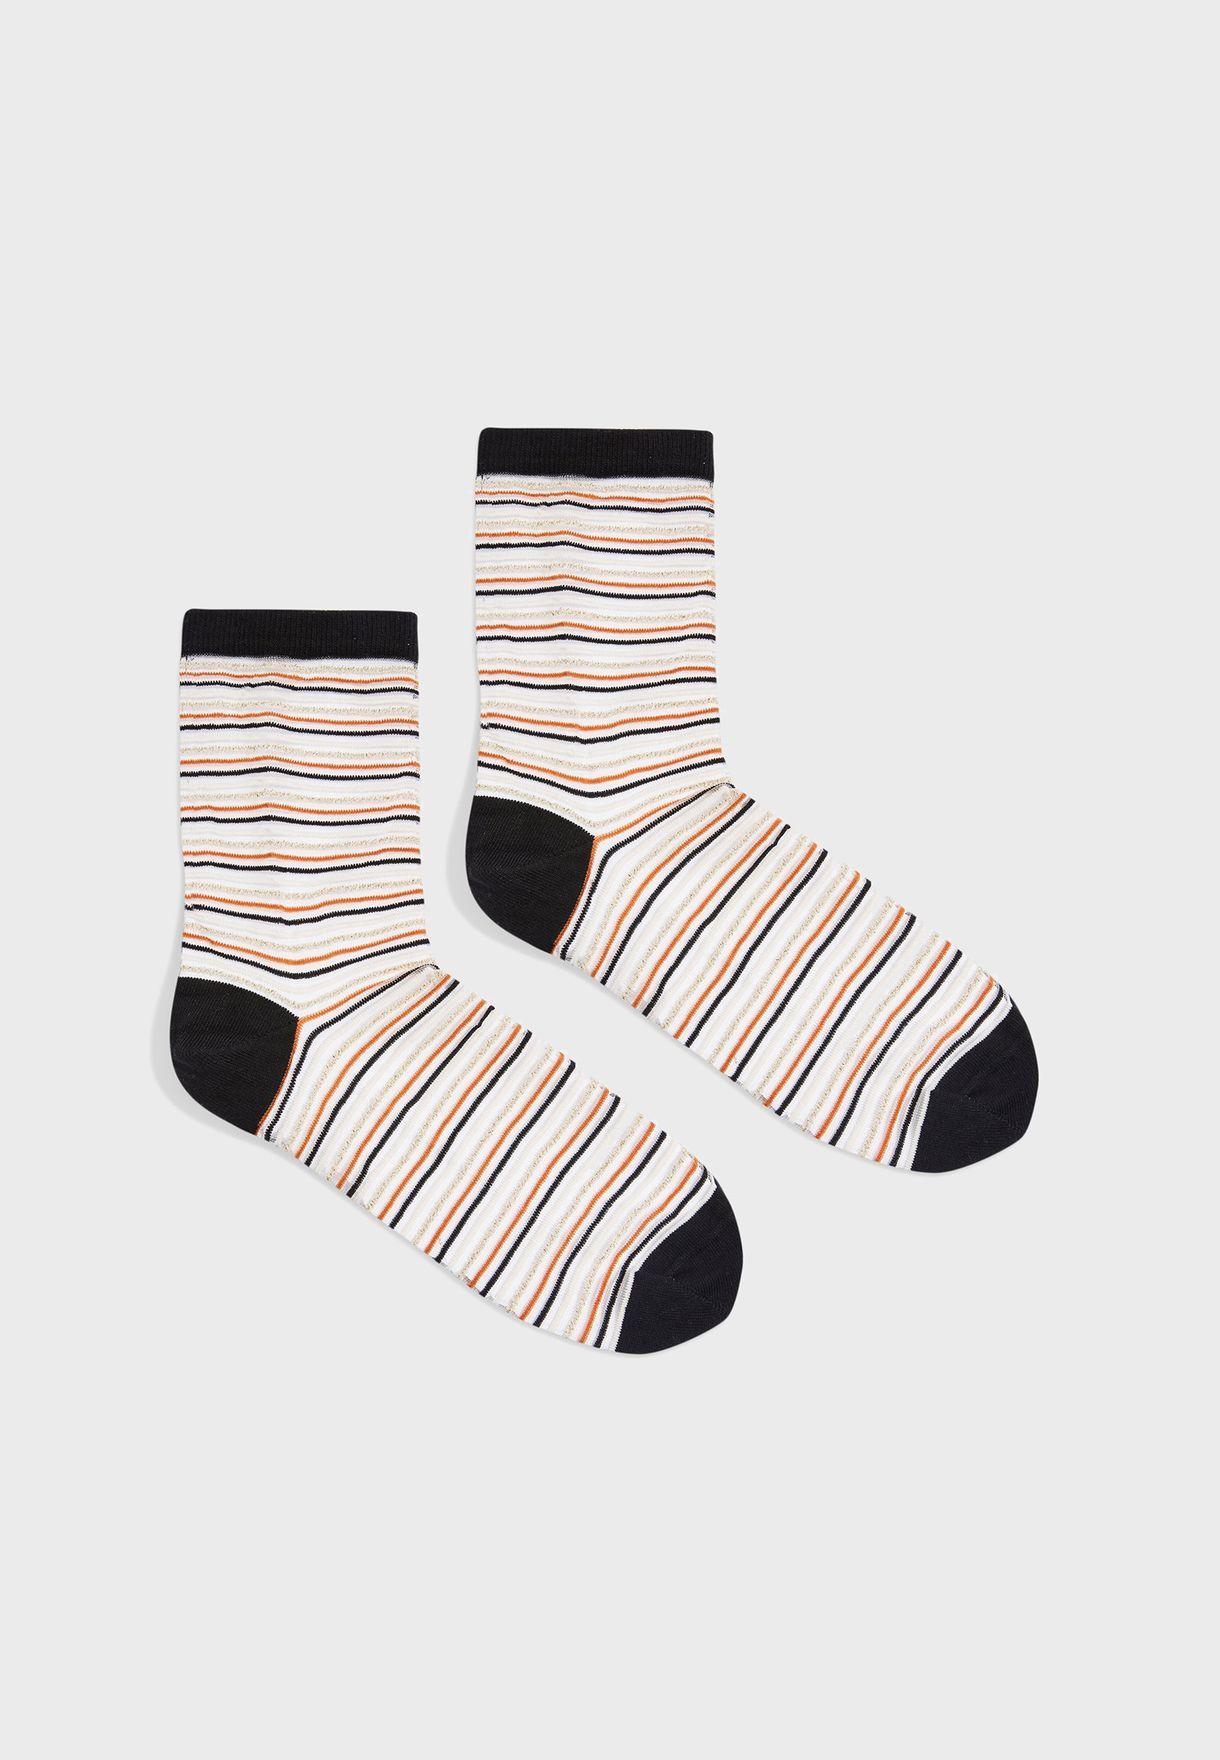 Sheer Striped Socks